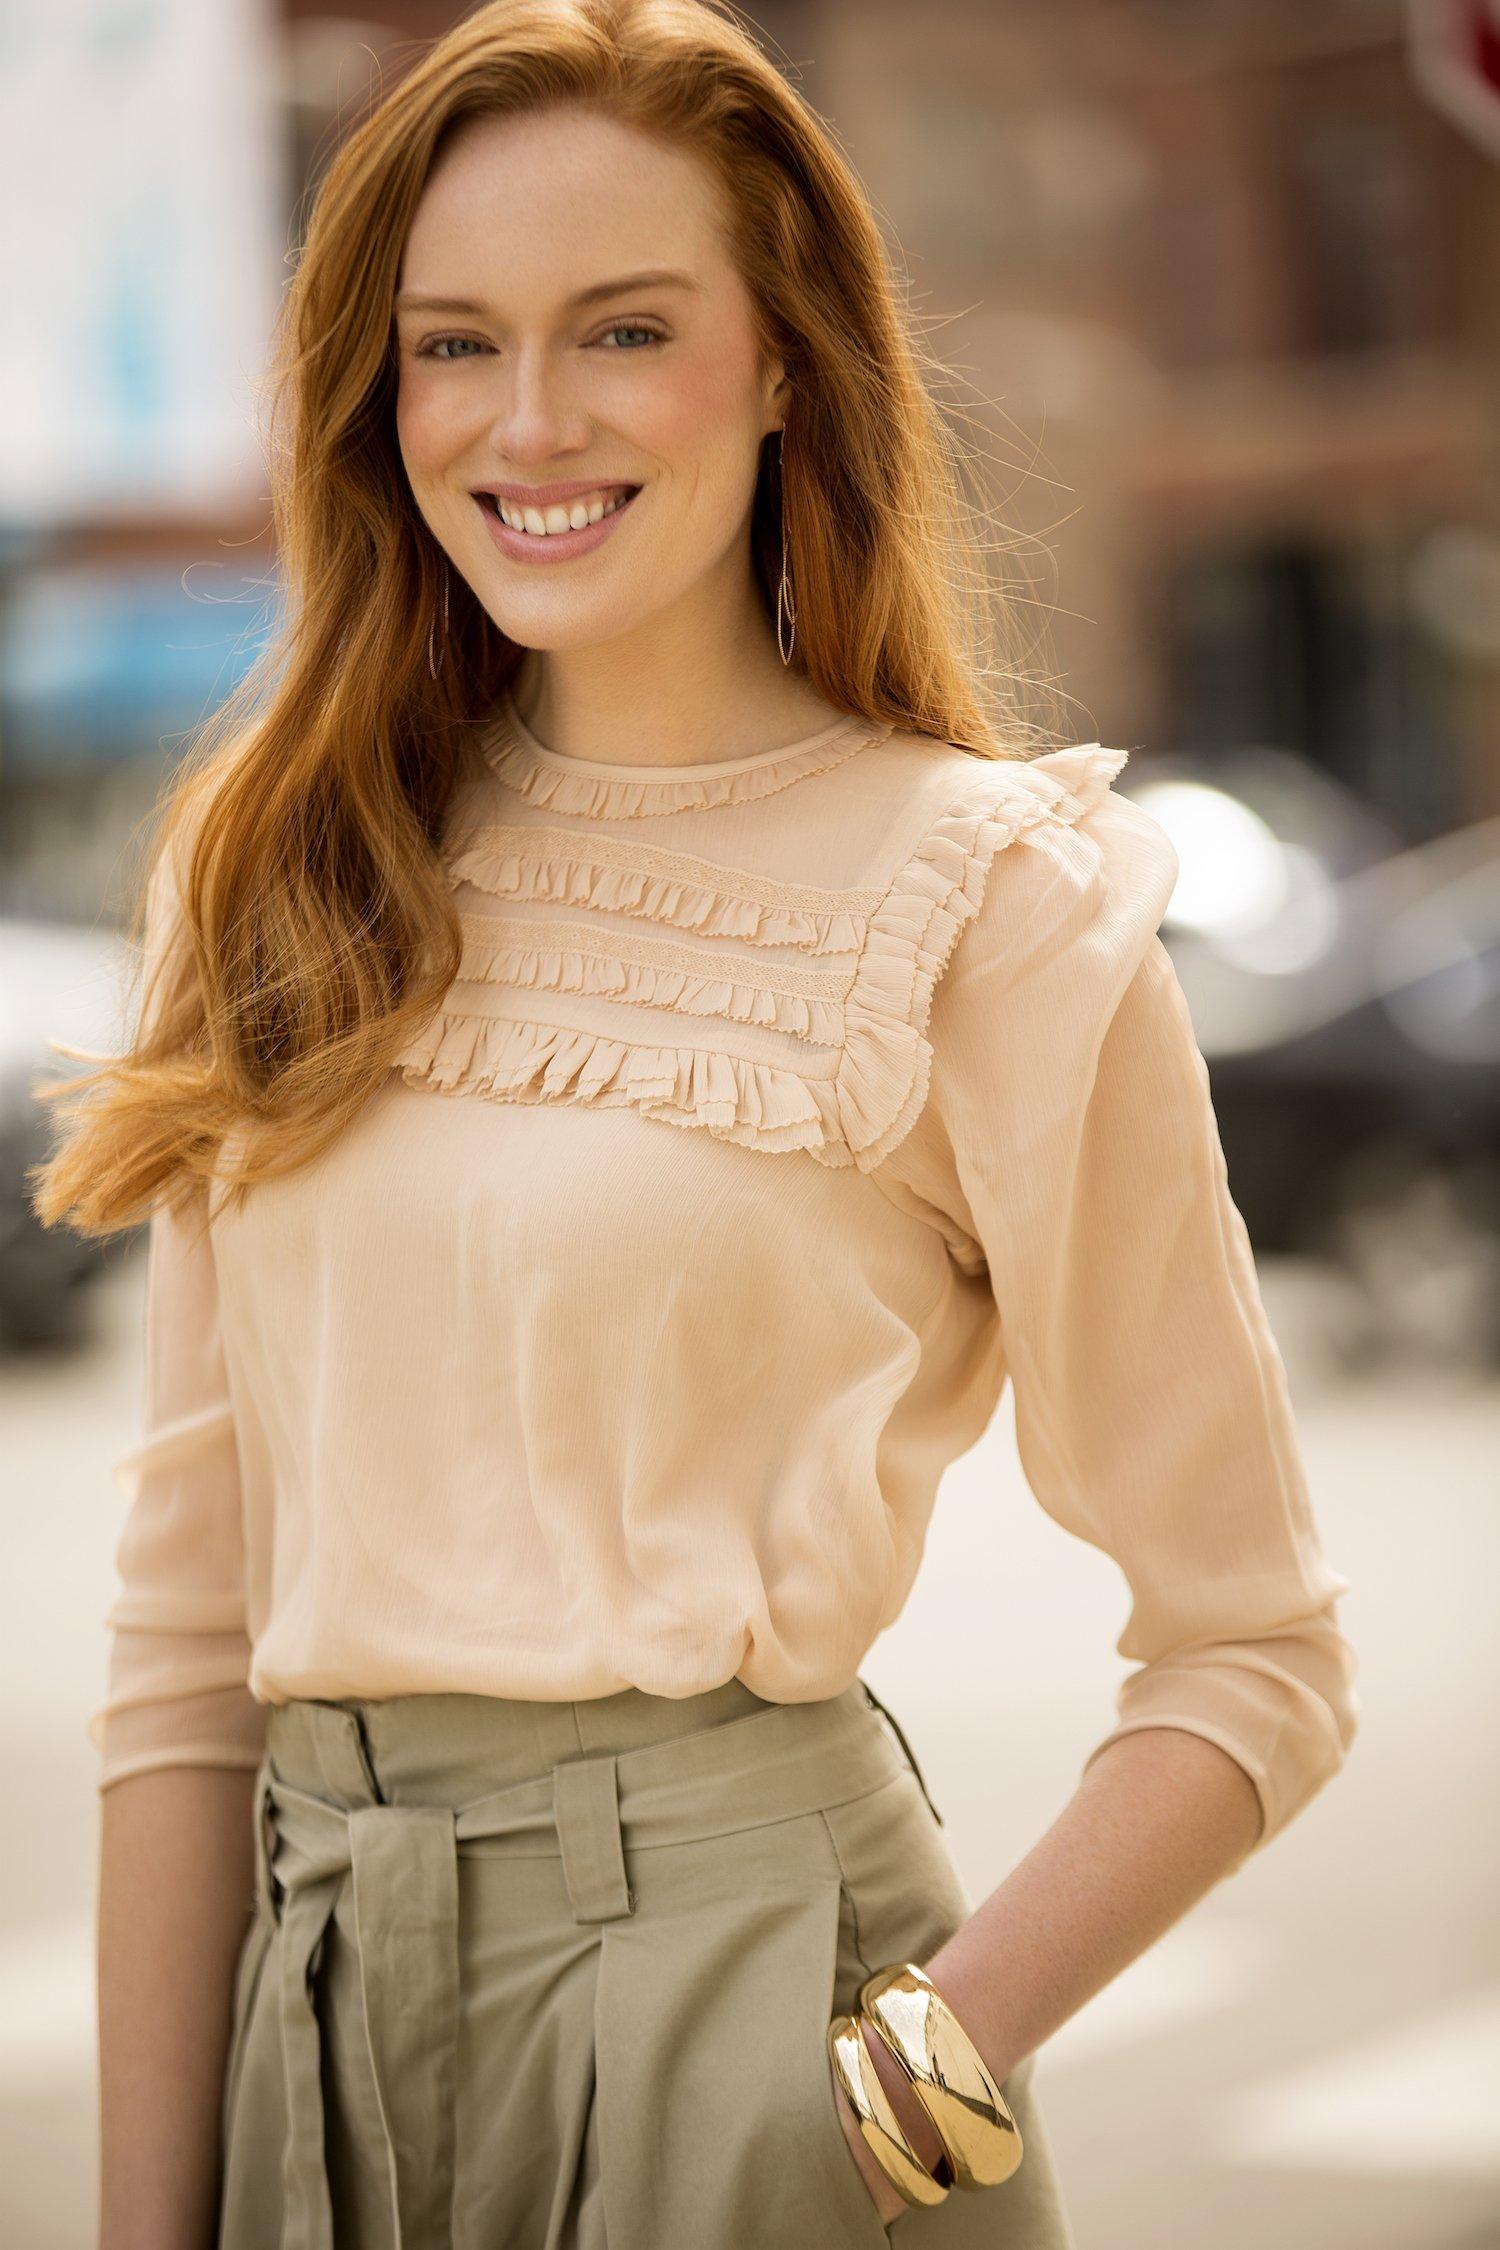 Amelia Forczak